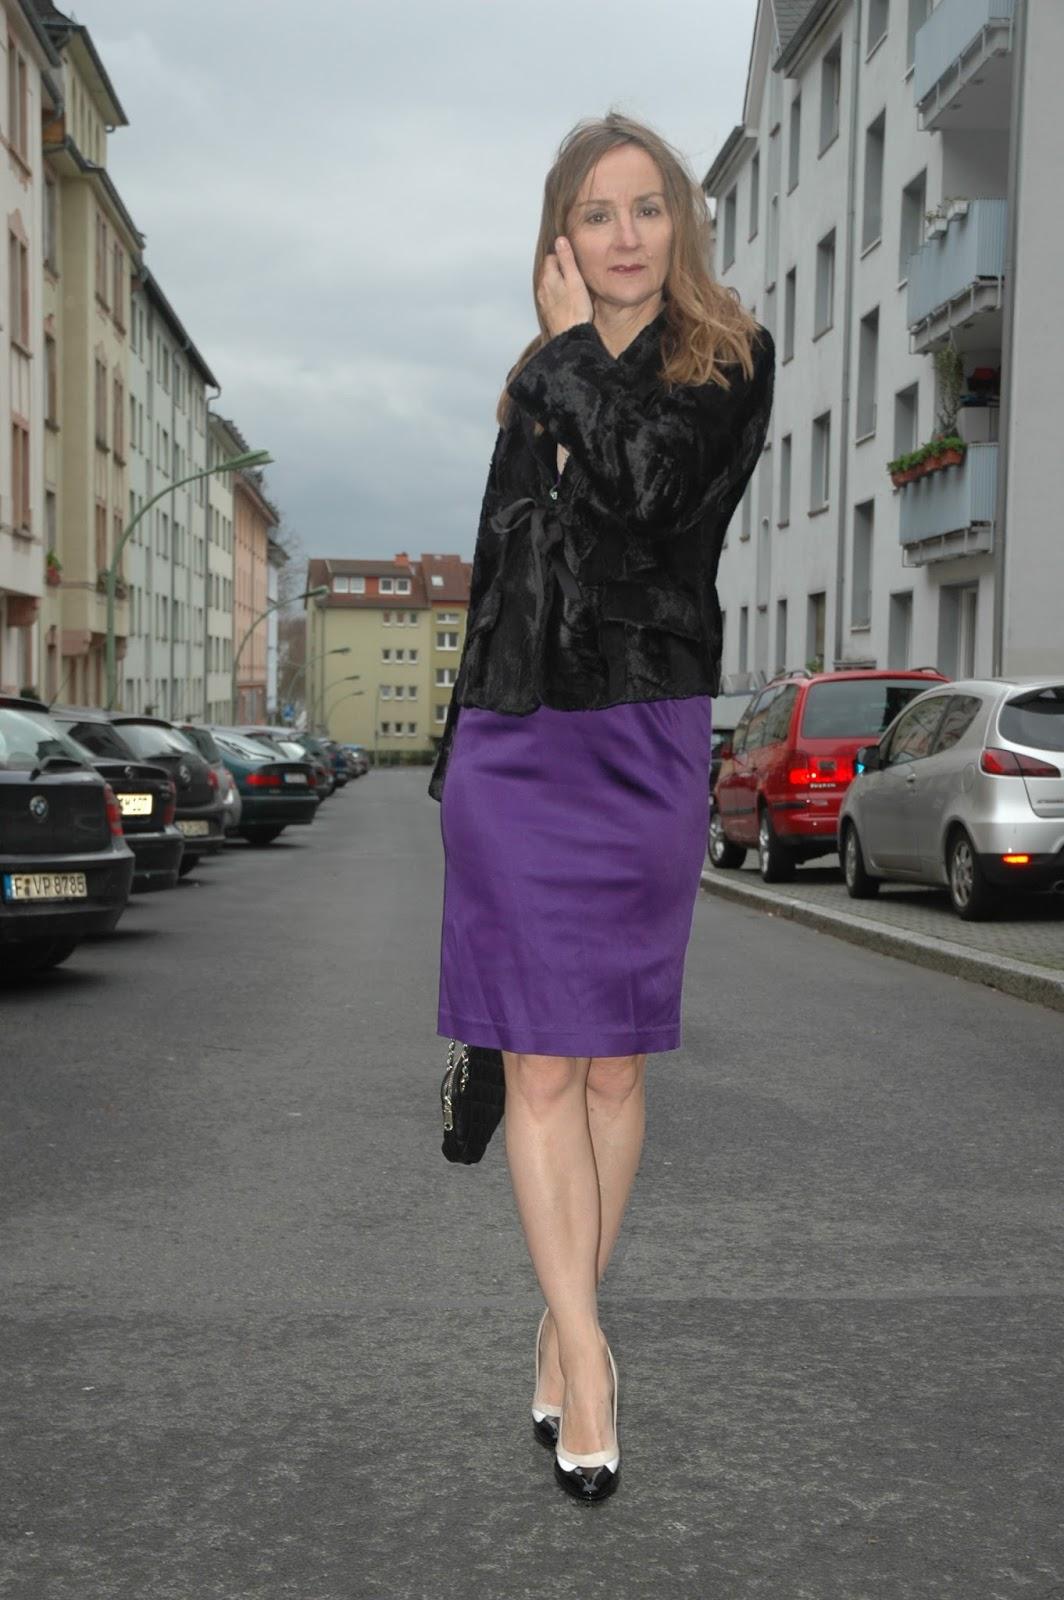 lila_Satin-kleid.jpg